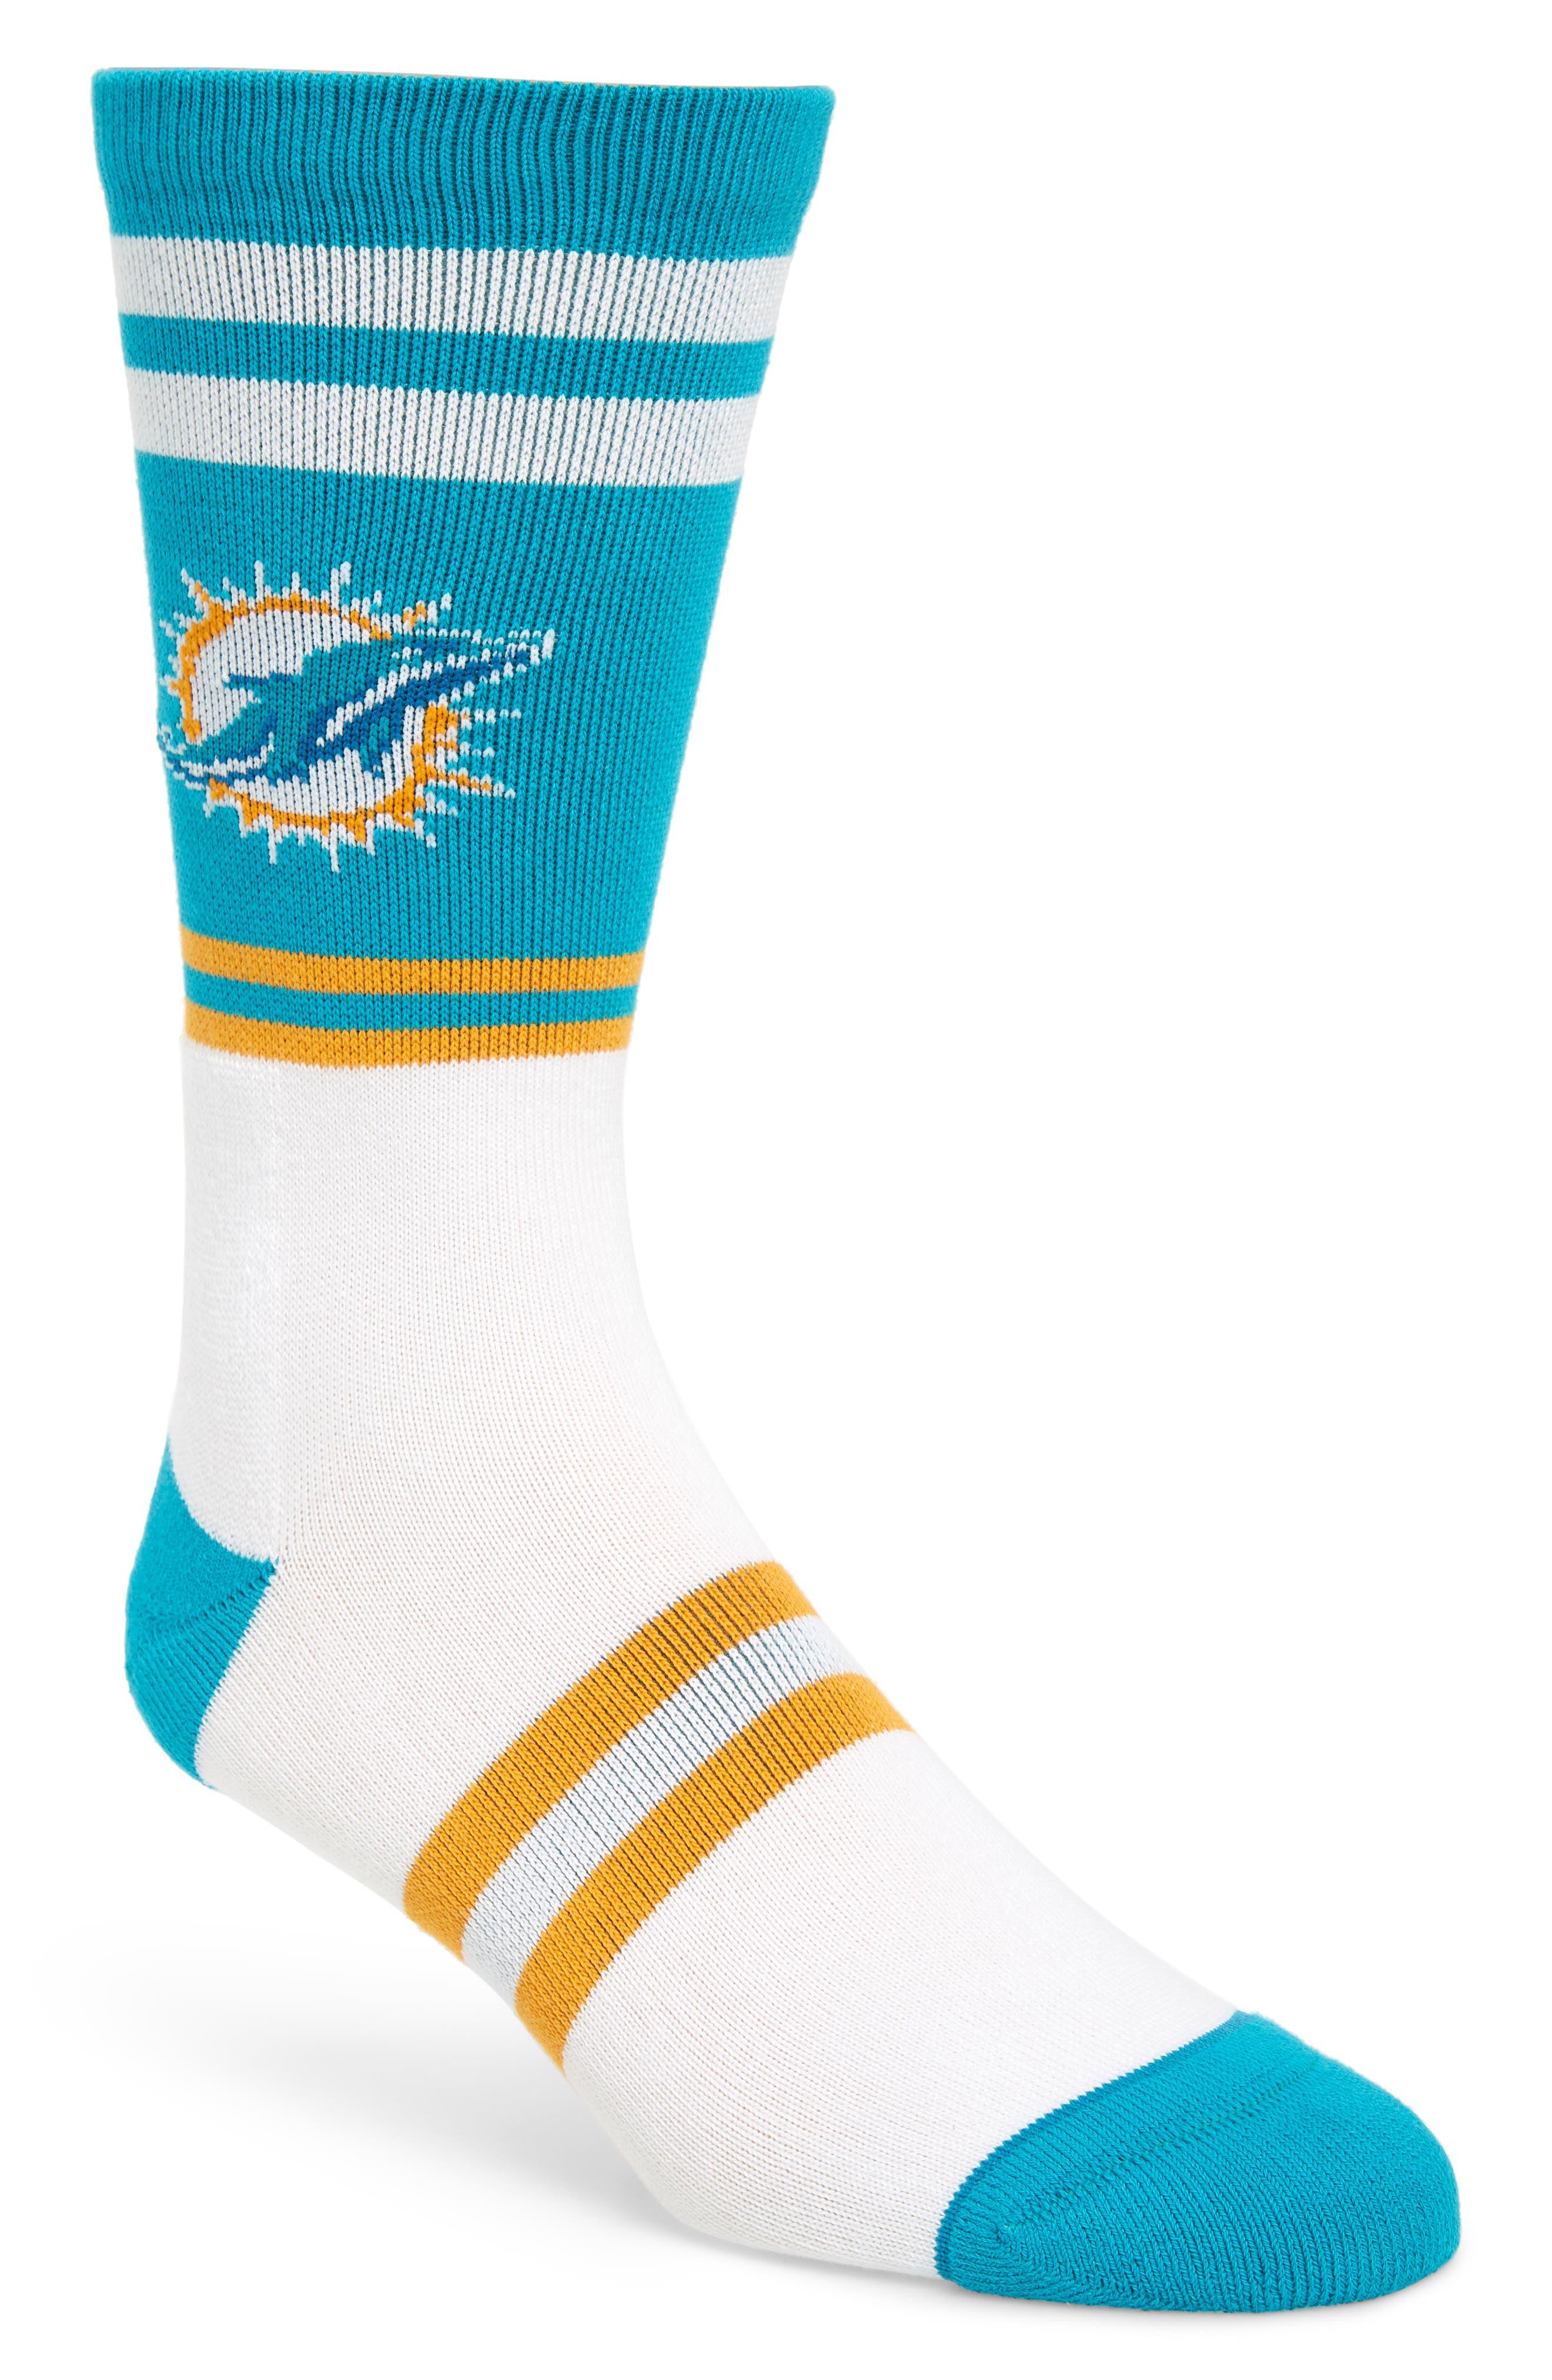 Miami Dolphins Socks,                             Main thumbnail 1, color,                             440